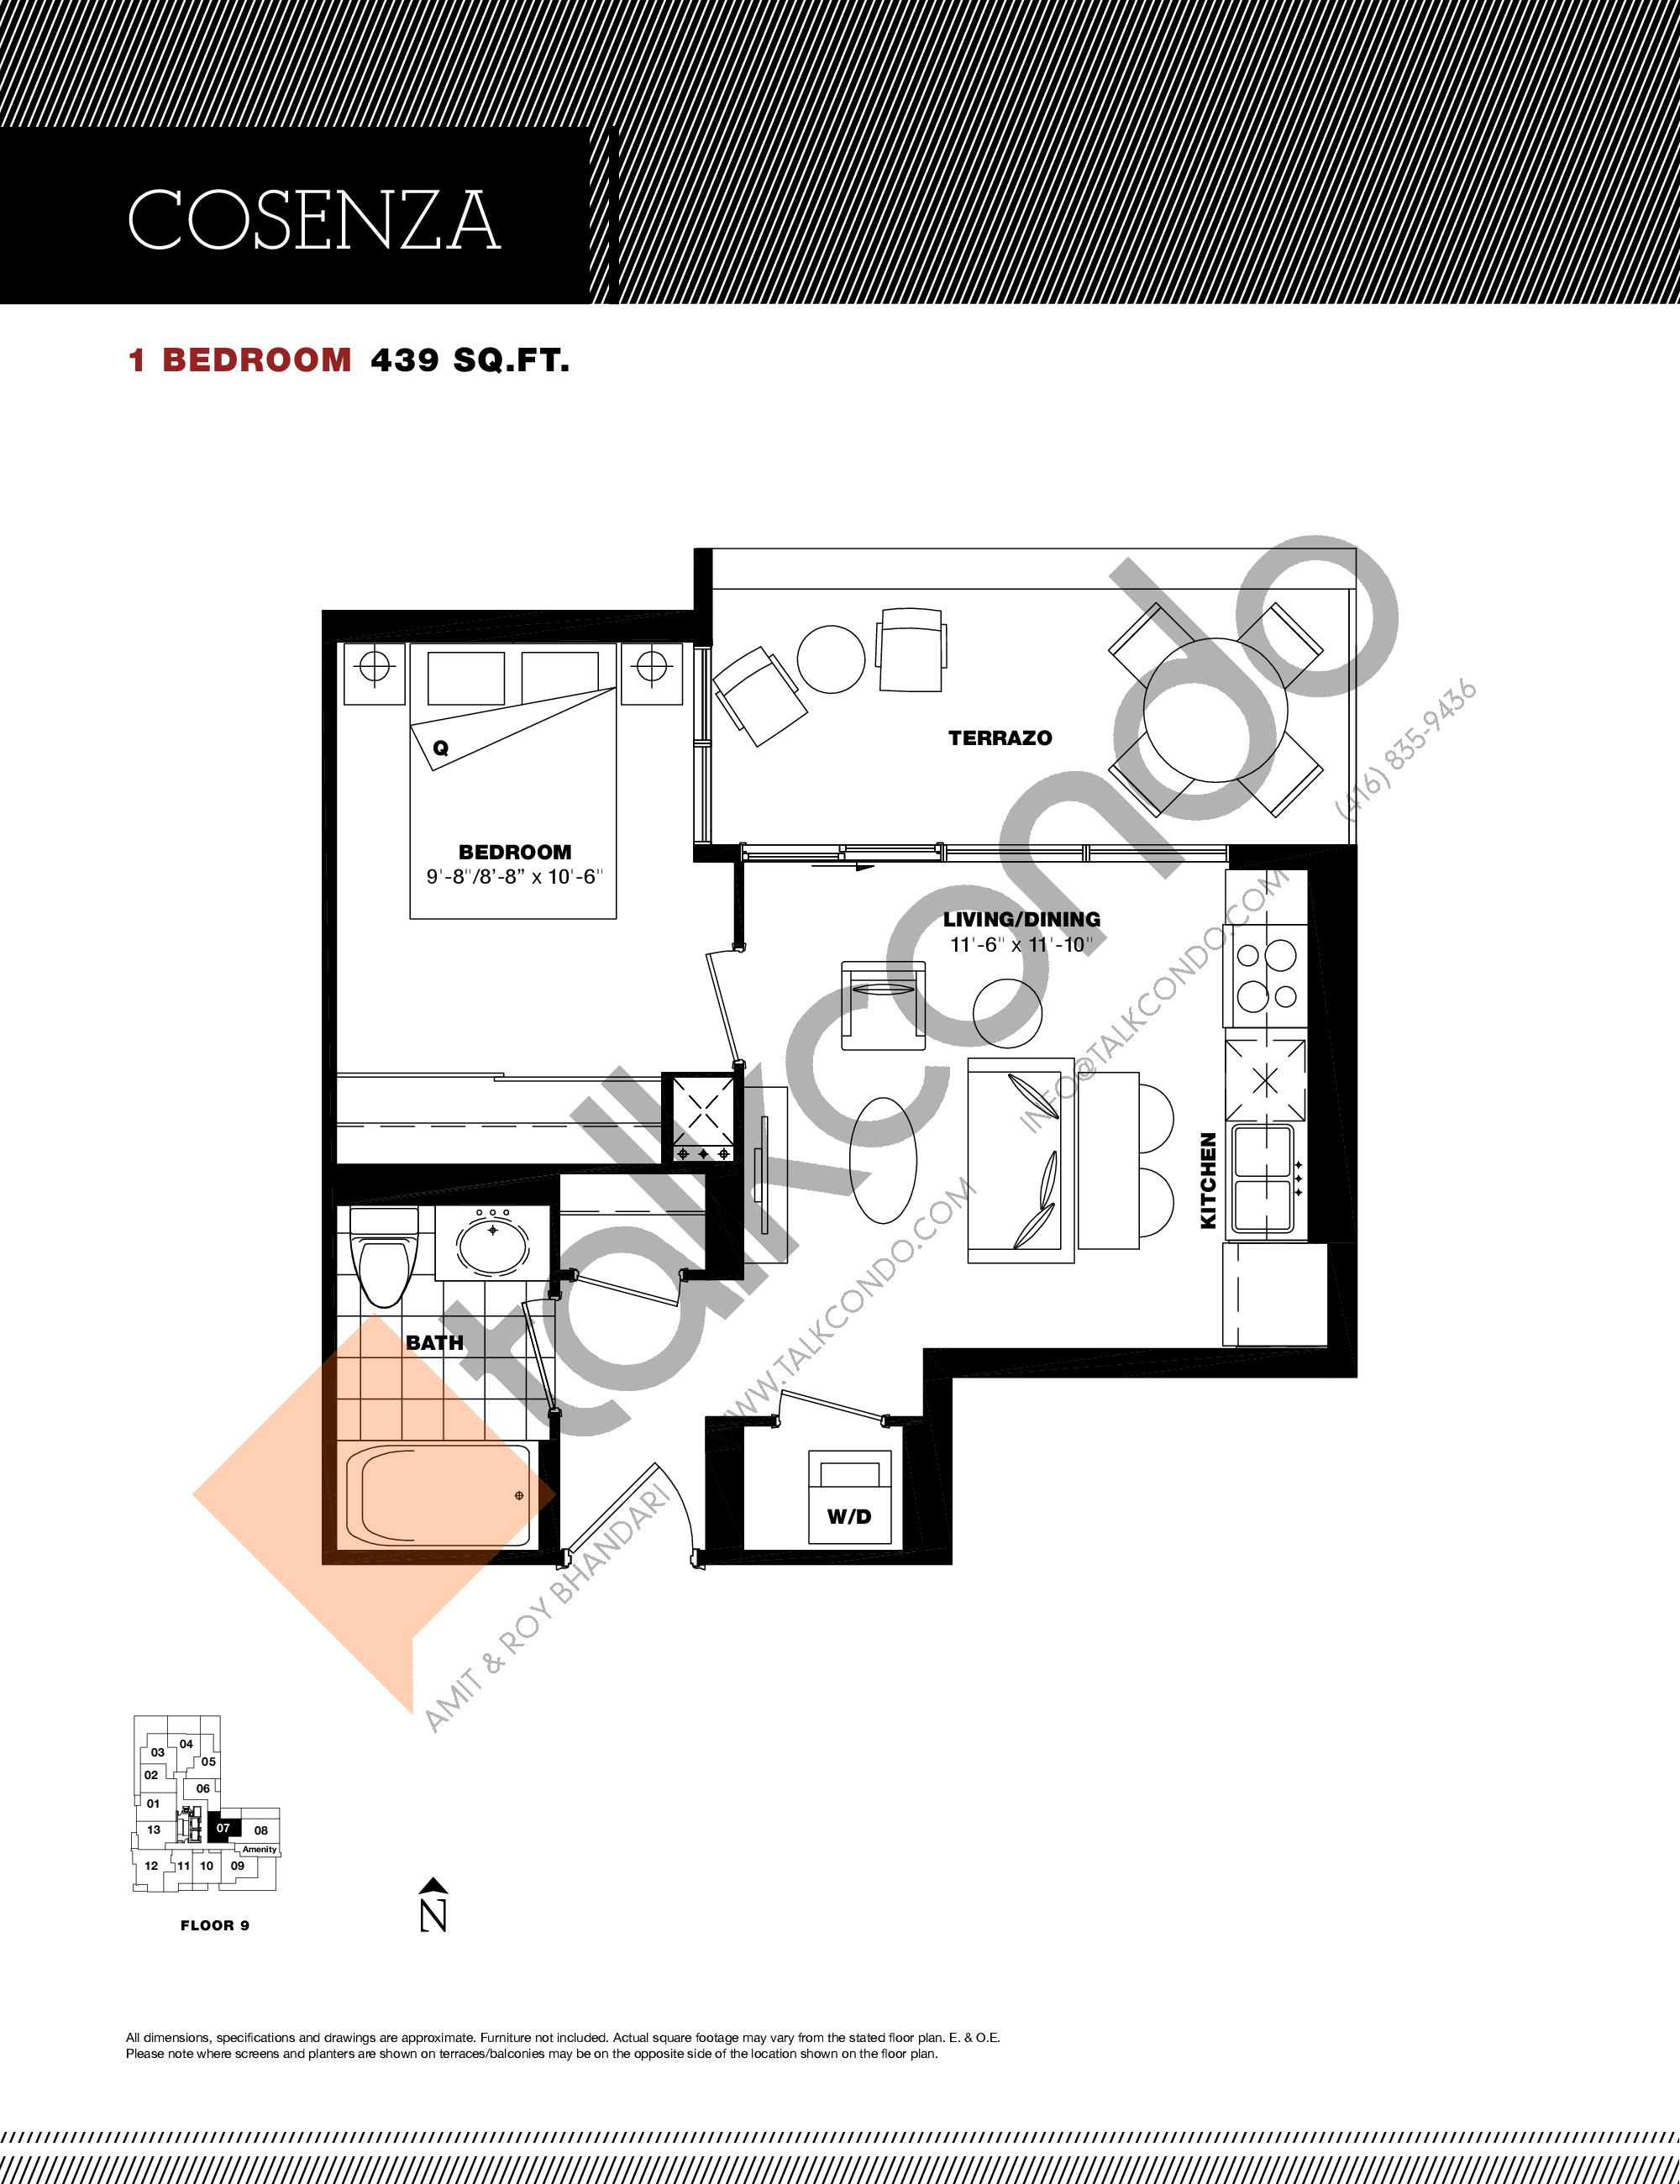 Cosenza Floor Plan at Residenze Palazzo at Treviso 3 Condos - 439 sq.ft